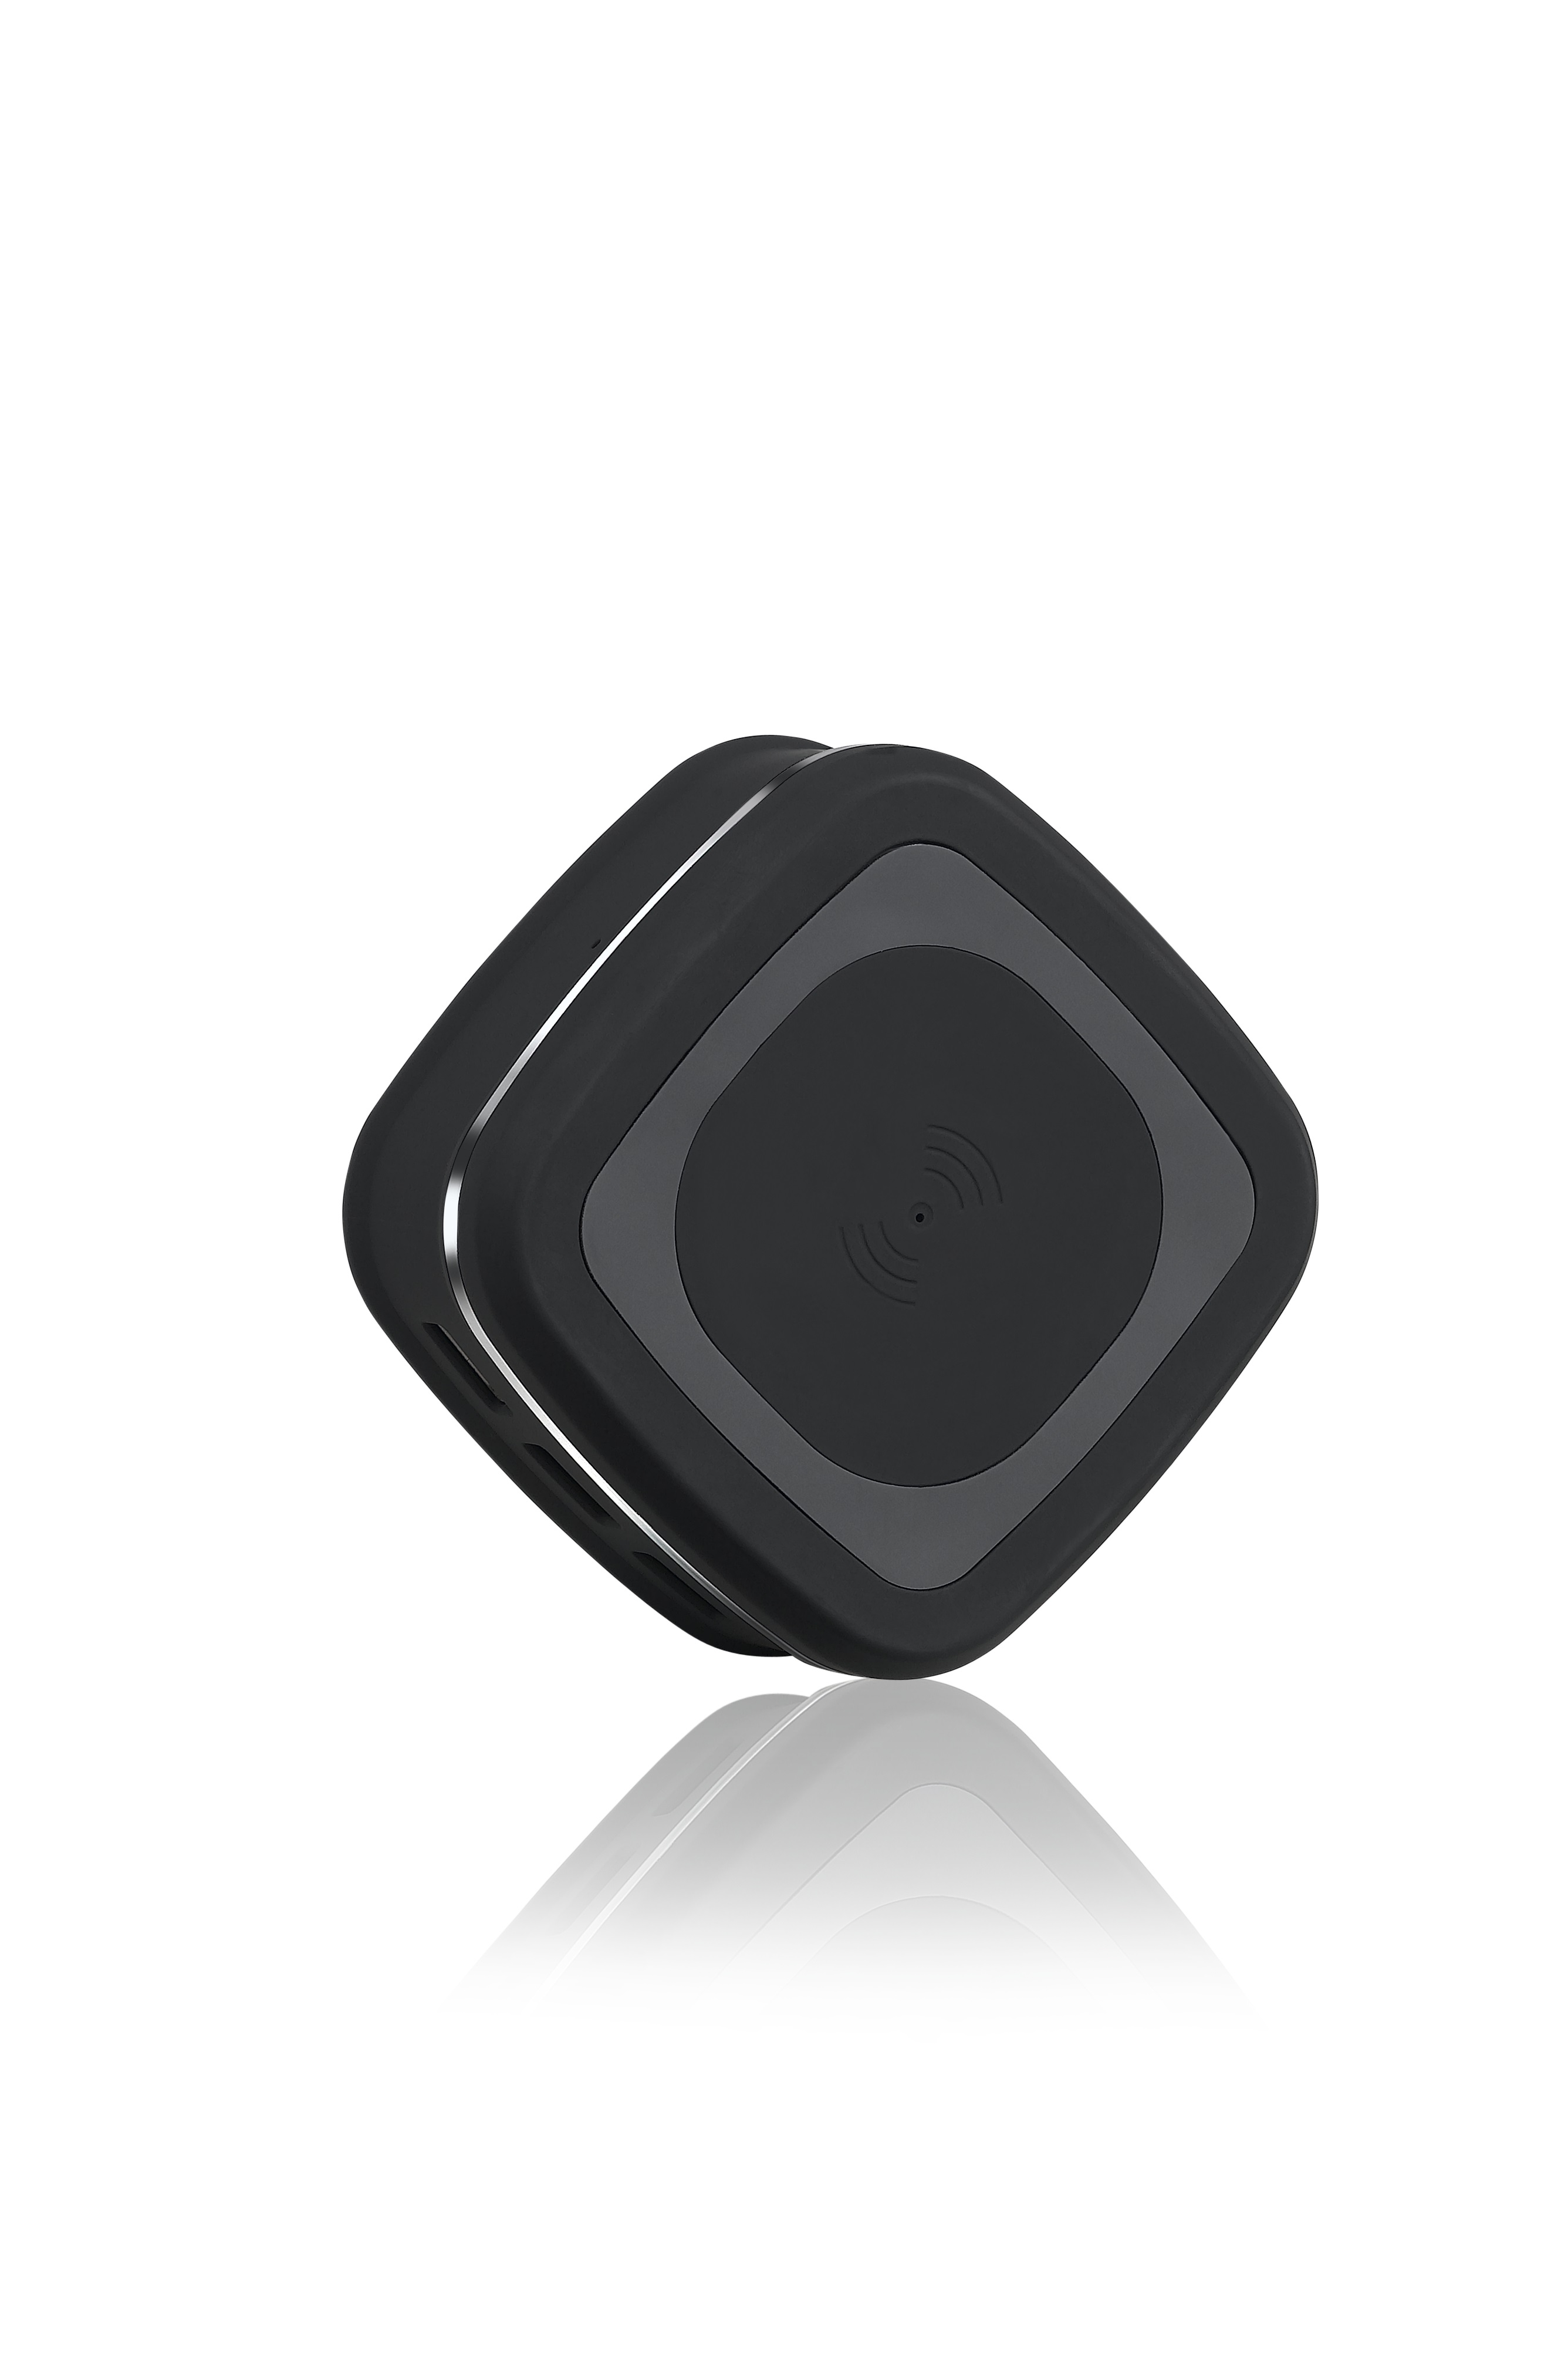 qi charger wireless ladestation komp mit iphone 10. Black Bedroom Furniture Sets. Home Design Ideas